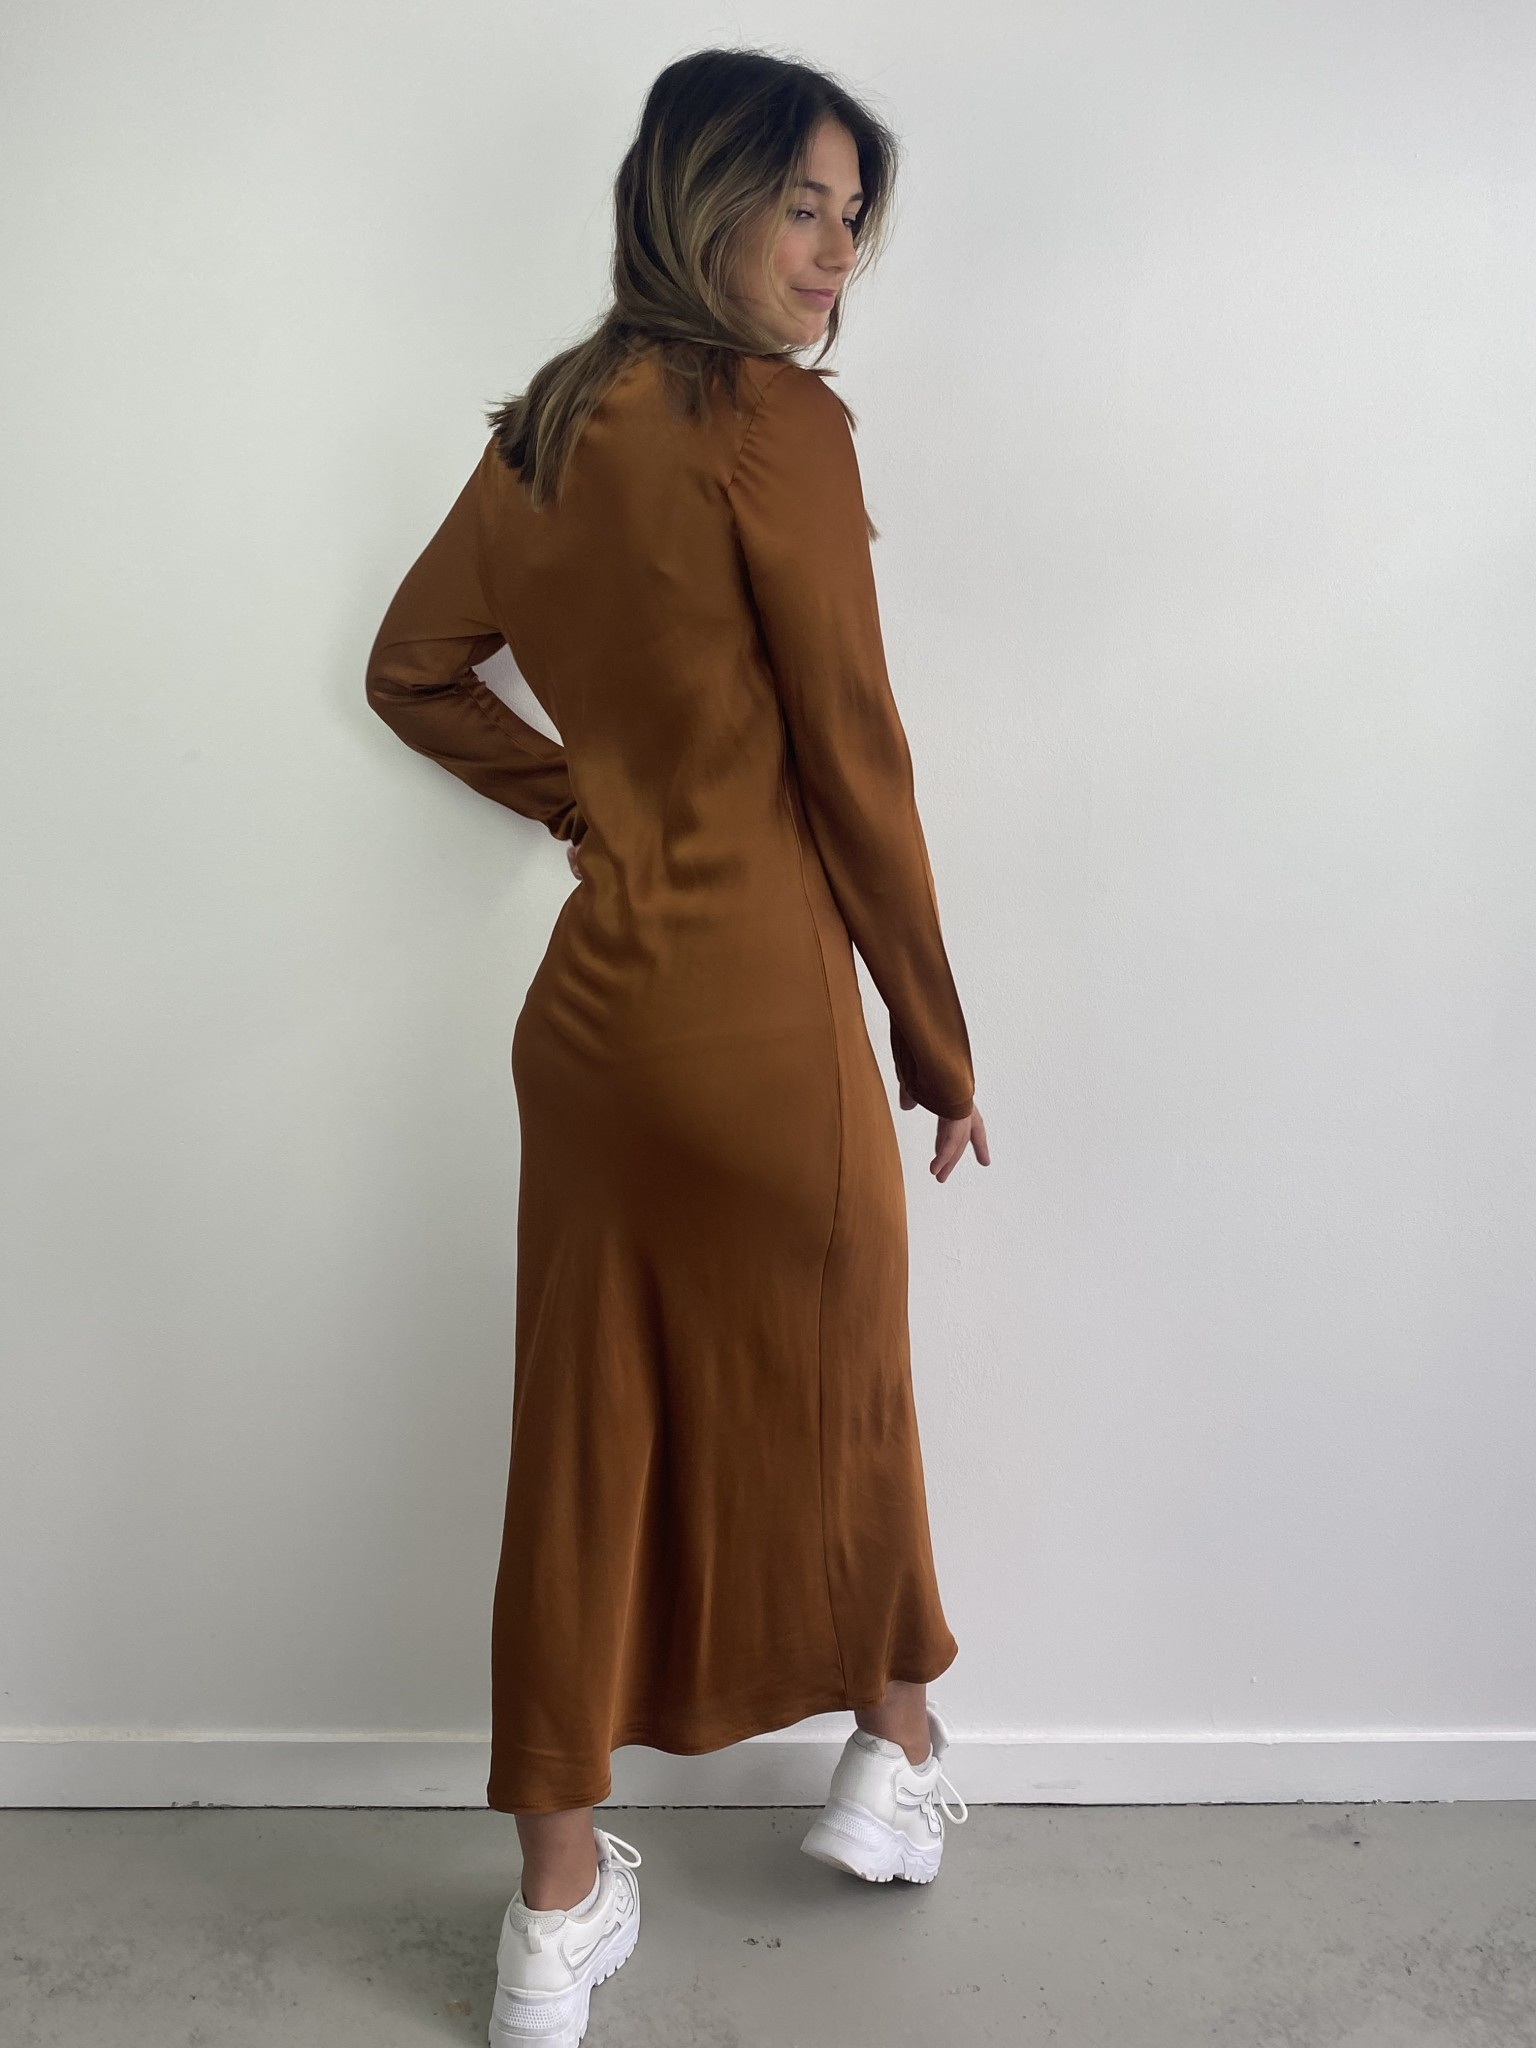 Sidone satin long dress Camel-4